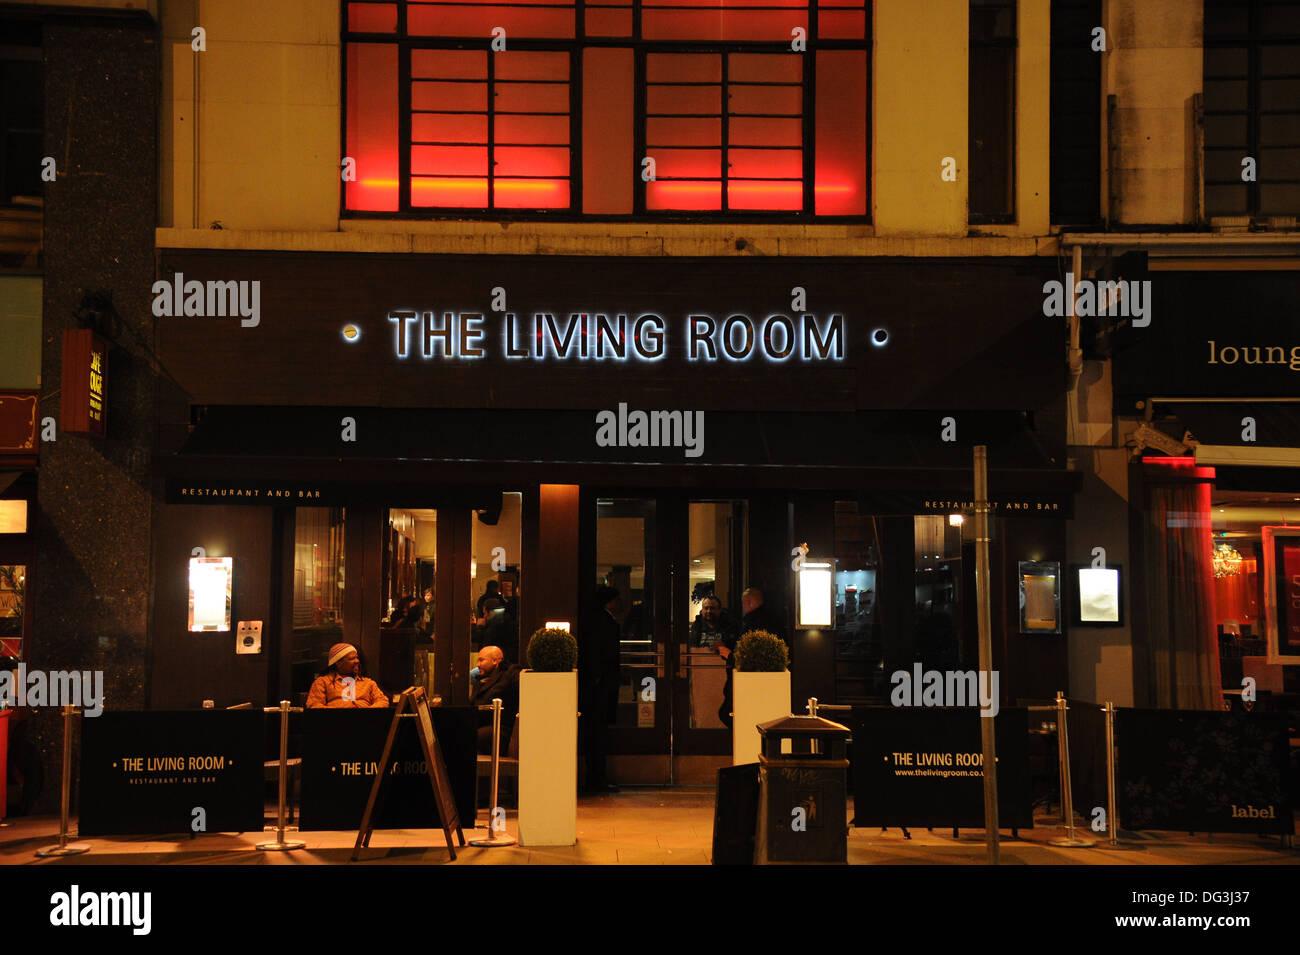 Wohnzimmer Restaurant, wohnzimmer-restaurant und eine bar an der nacht manchester, uk, Design ideen